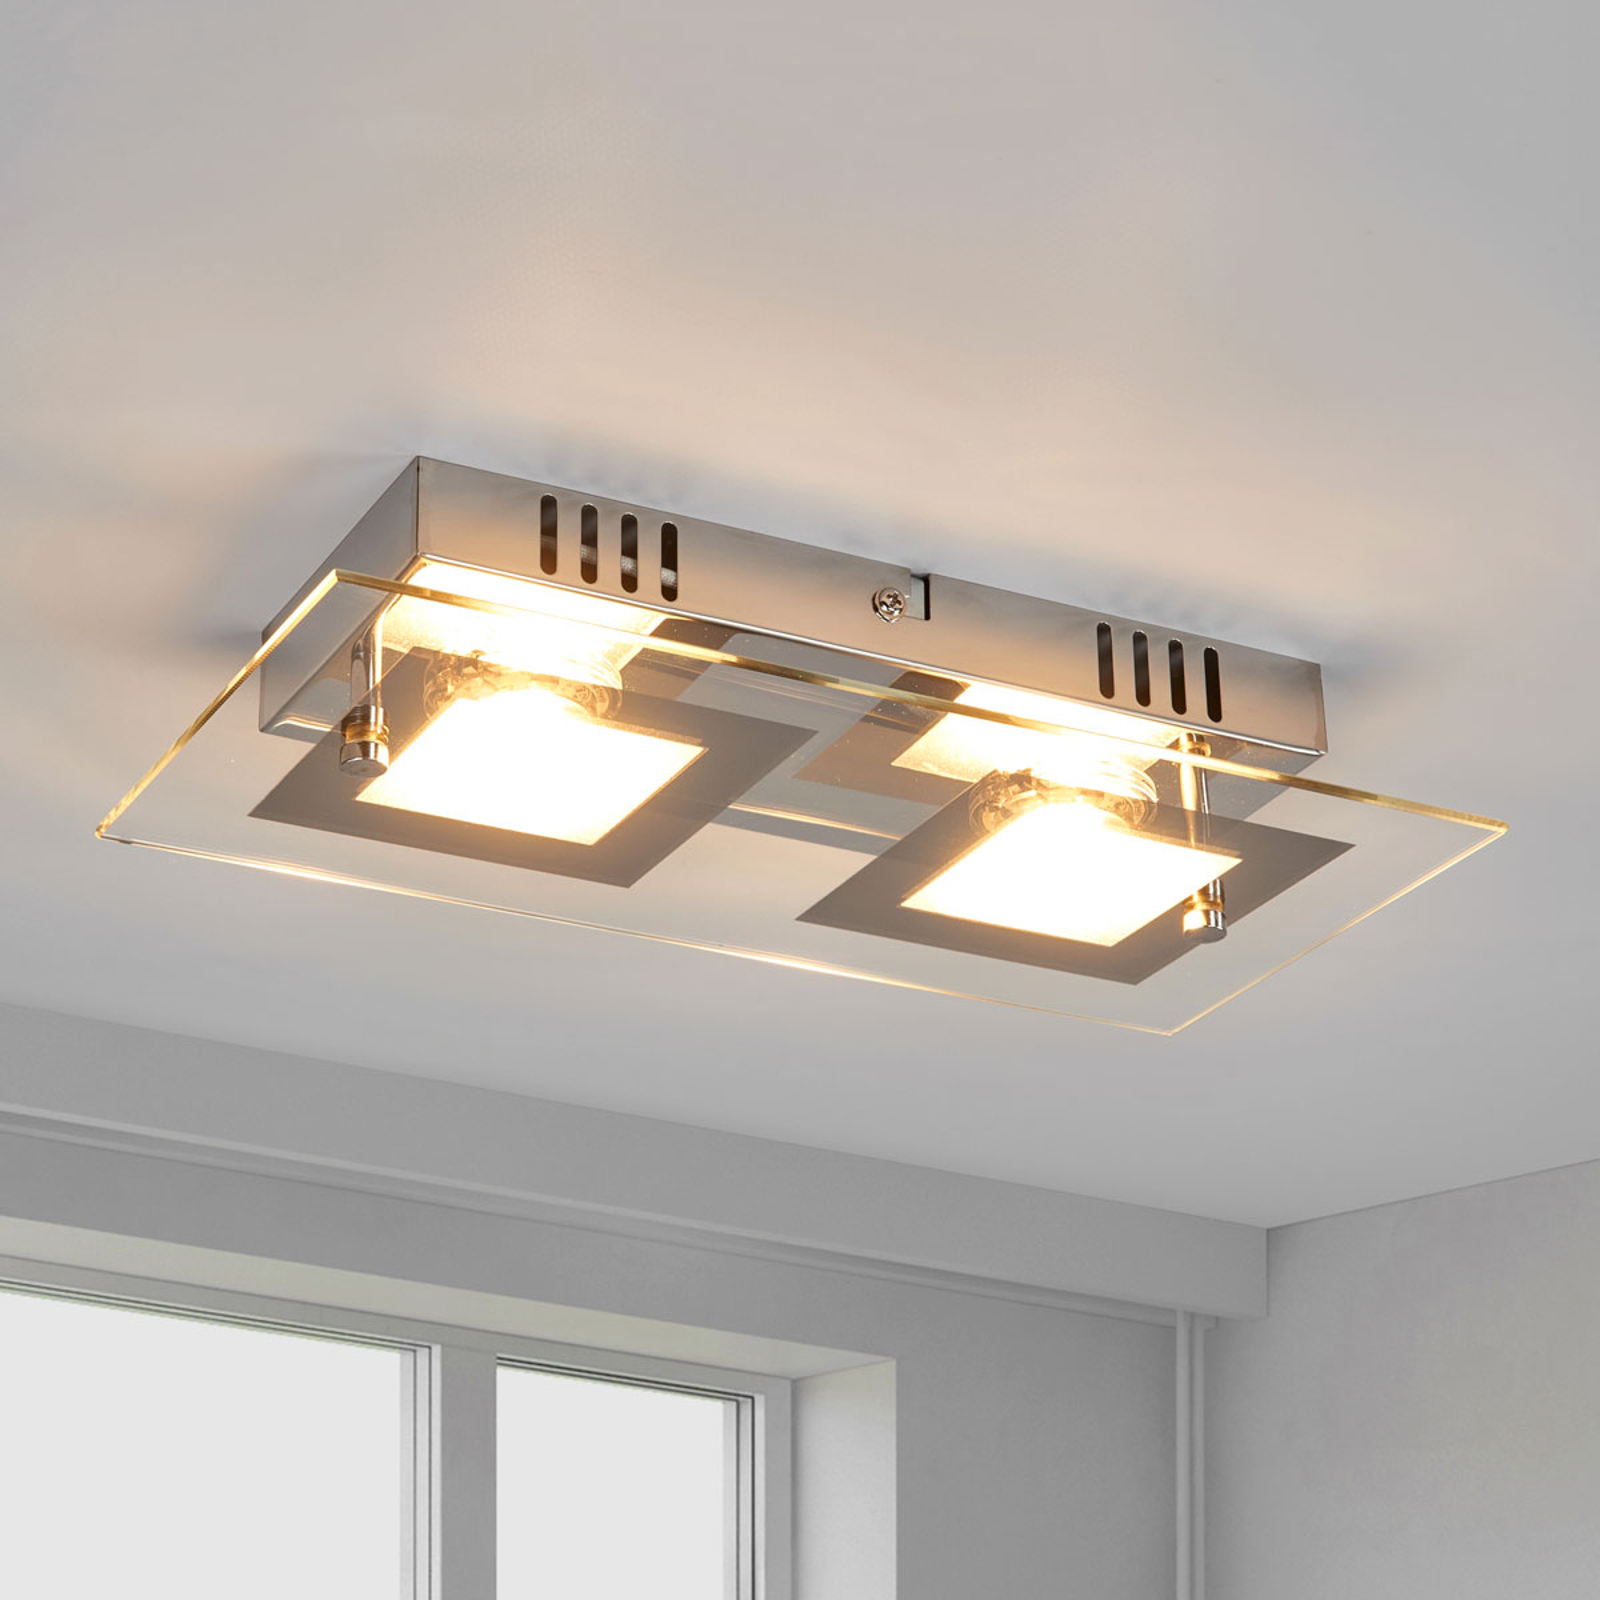 Manja - zweiflammige LED-Deckenlampe in Chrom